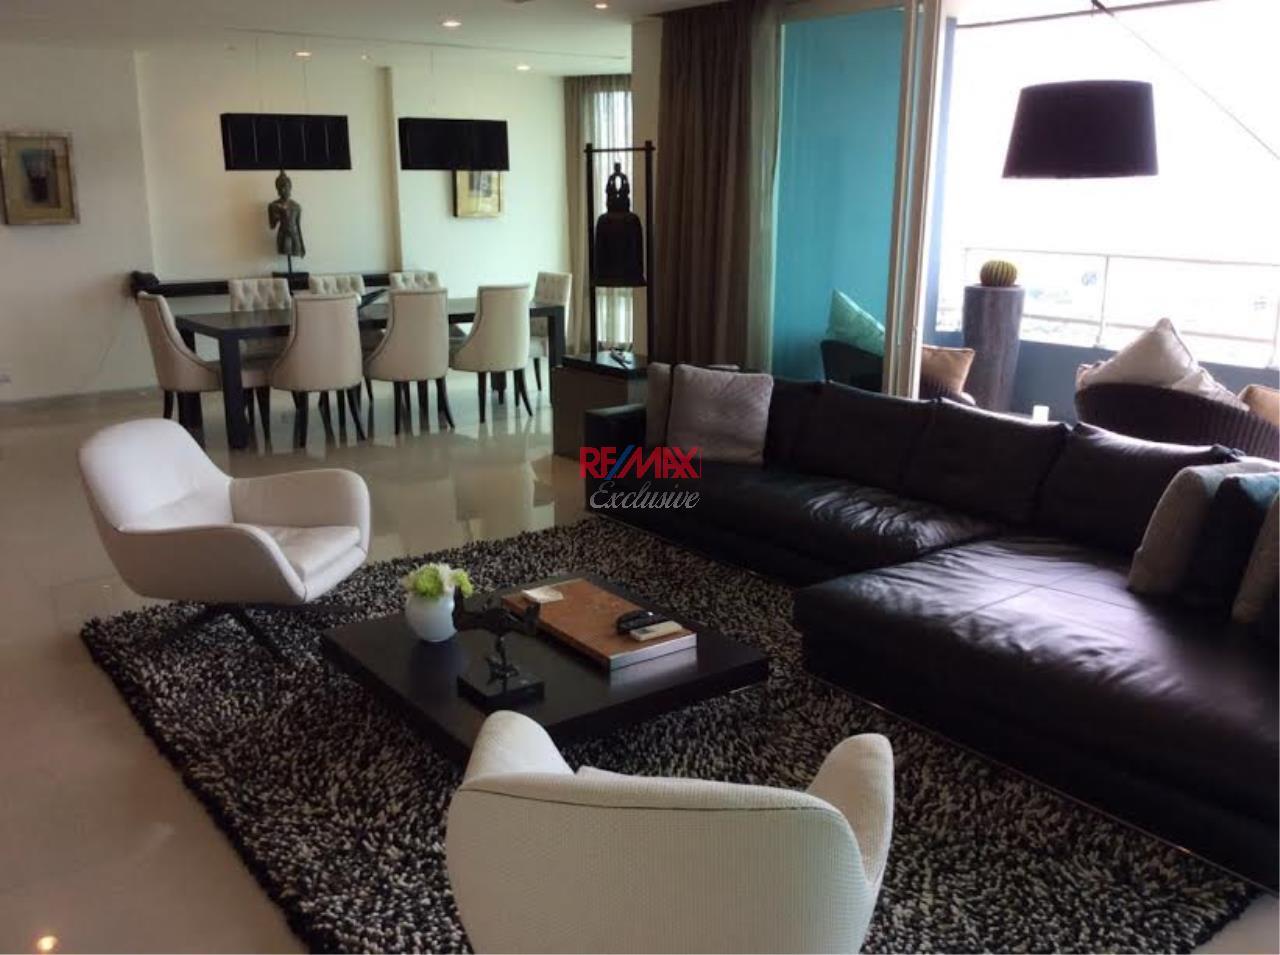 RE/MAX Exclusive Agency's Watermark Chaophraya Condominium, 4 bedrooms, 4 bathrooms, For Sale 47,500,000 THB 1